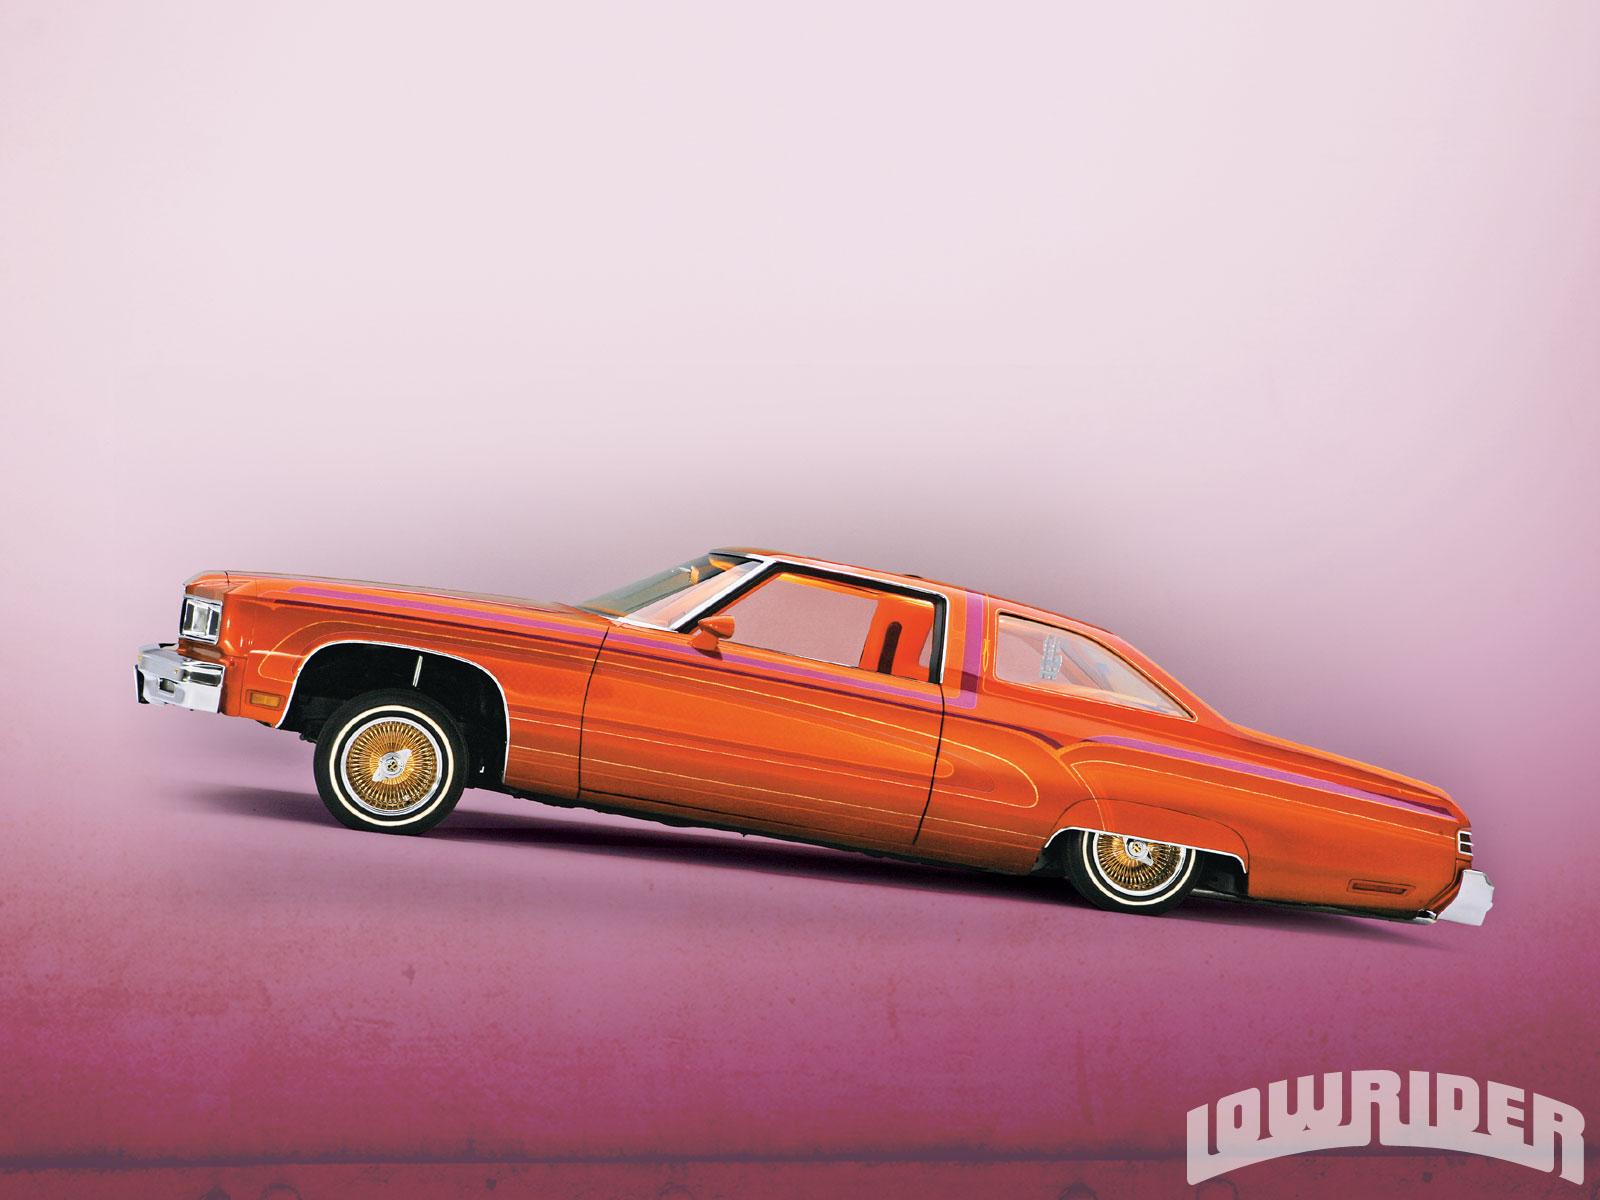 1976 Chevrolet Caprice - Lowrider Magazine